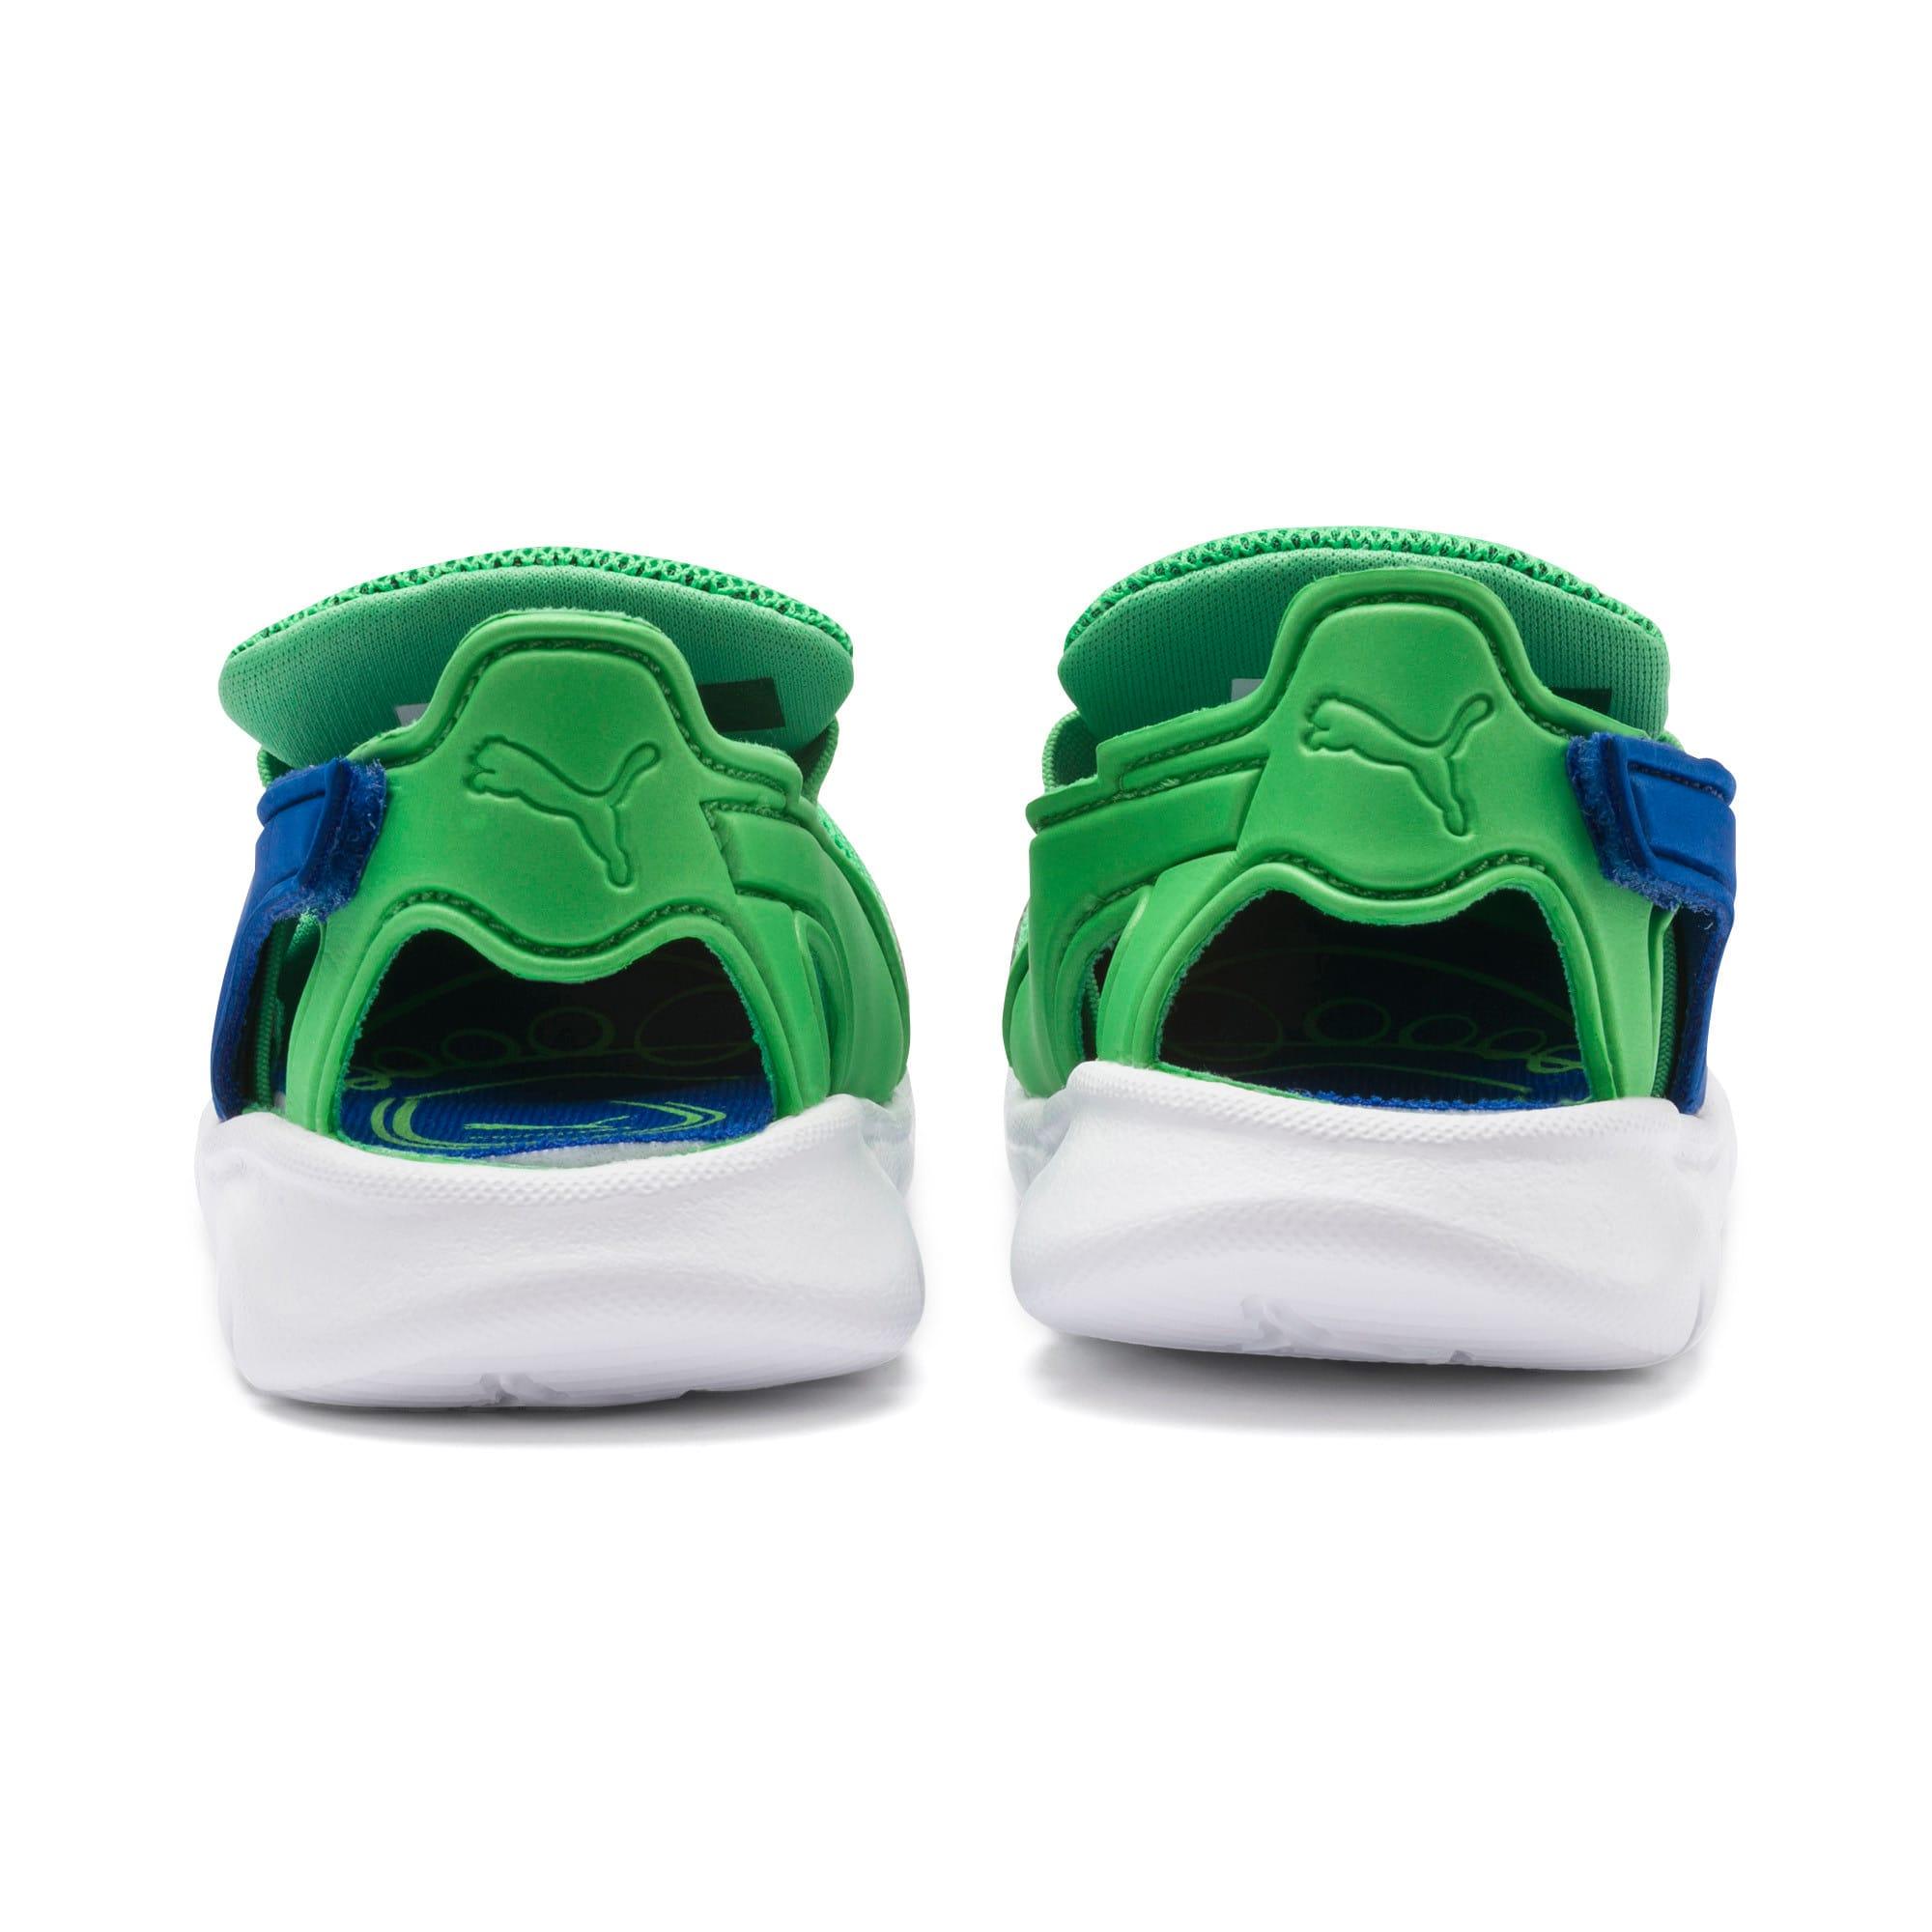 Thumbnail 4 of PUMA Bao 3 Open Toddler Shoes, Surf The Web-Irish Green, medium